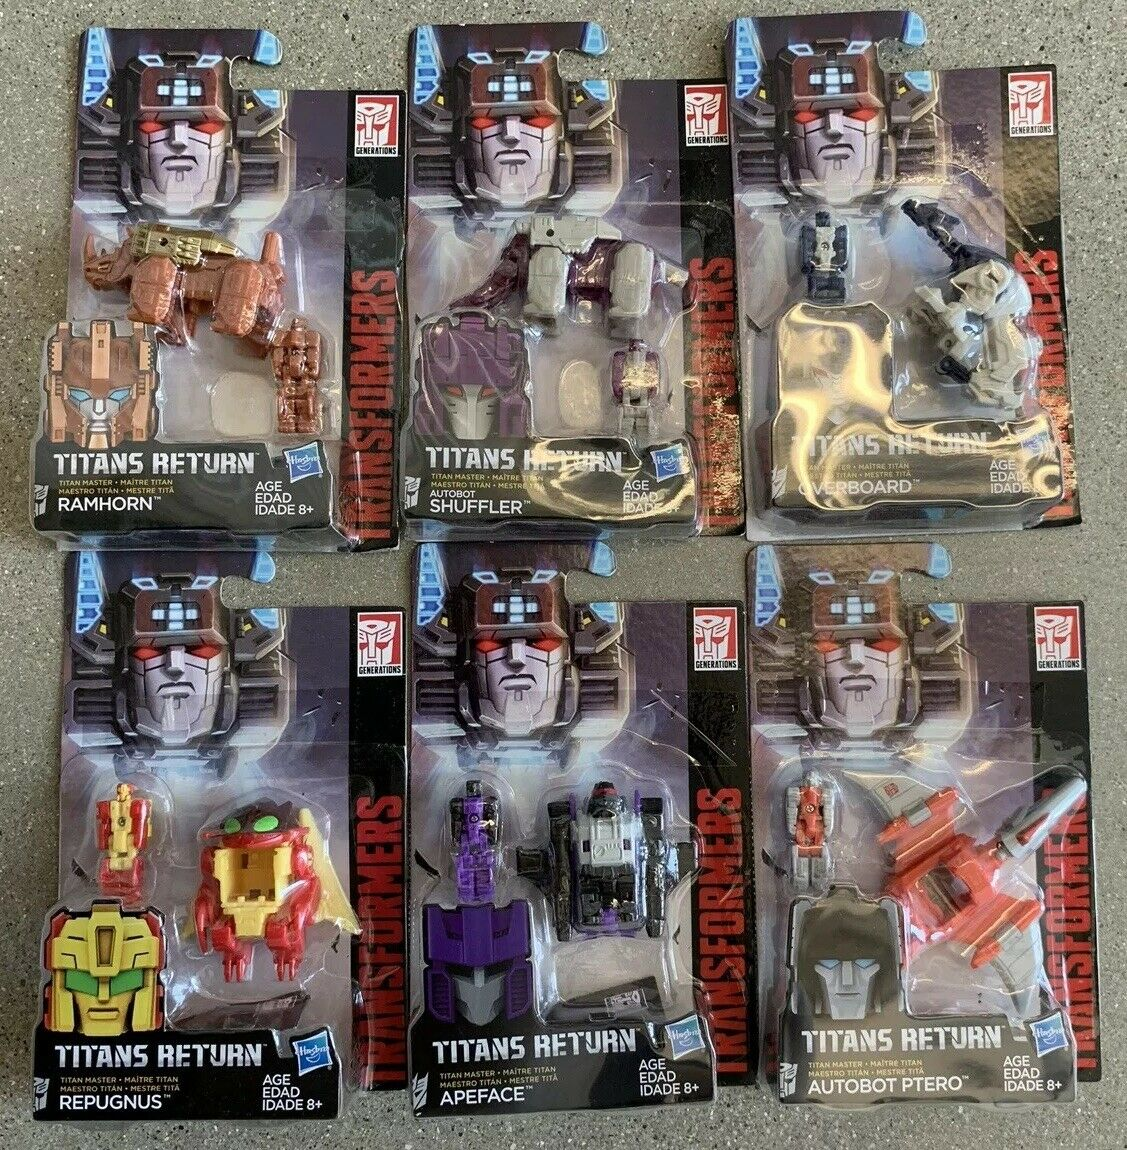 6x Transformers Generations Titans Return Head Master REPUGNUS RAMHORN SHUFFLER